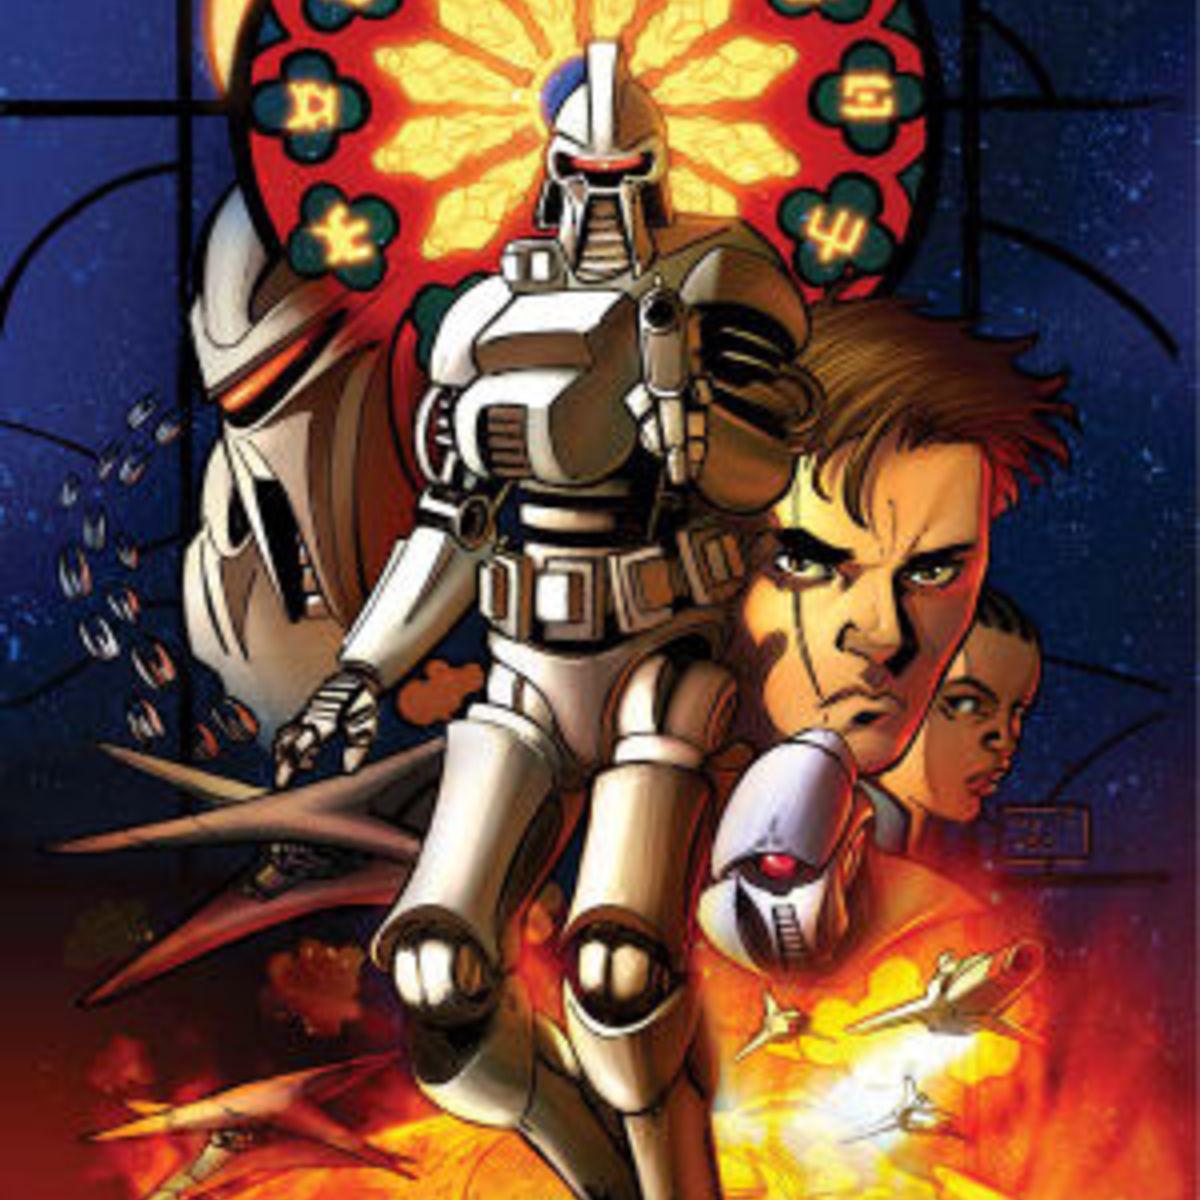 BattlestarGalactica_TheCylonWar_comic.jpg